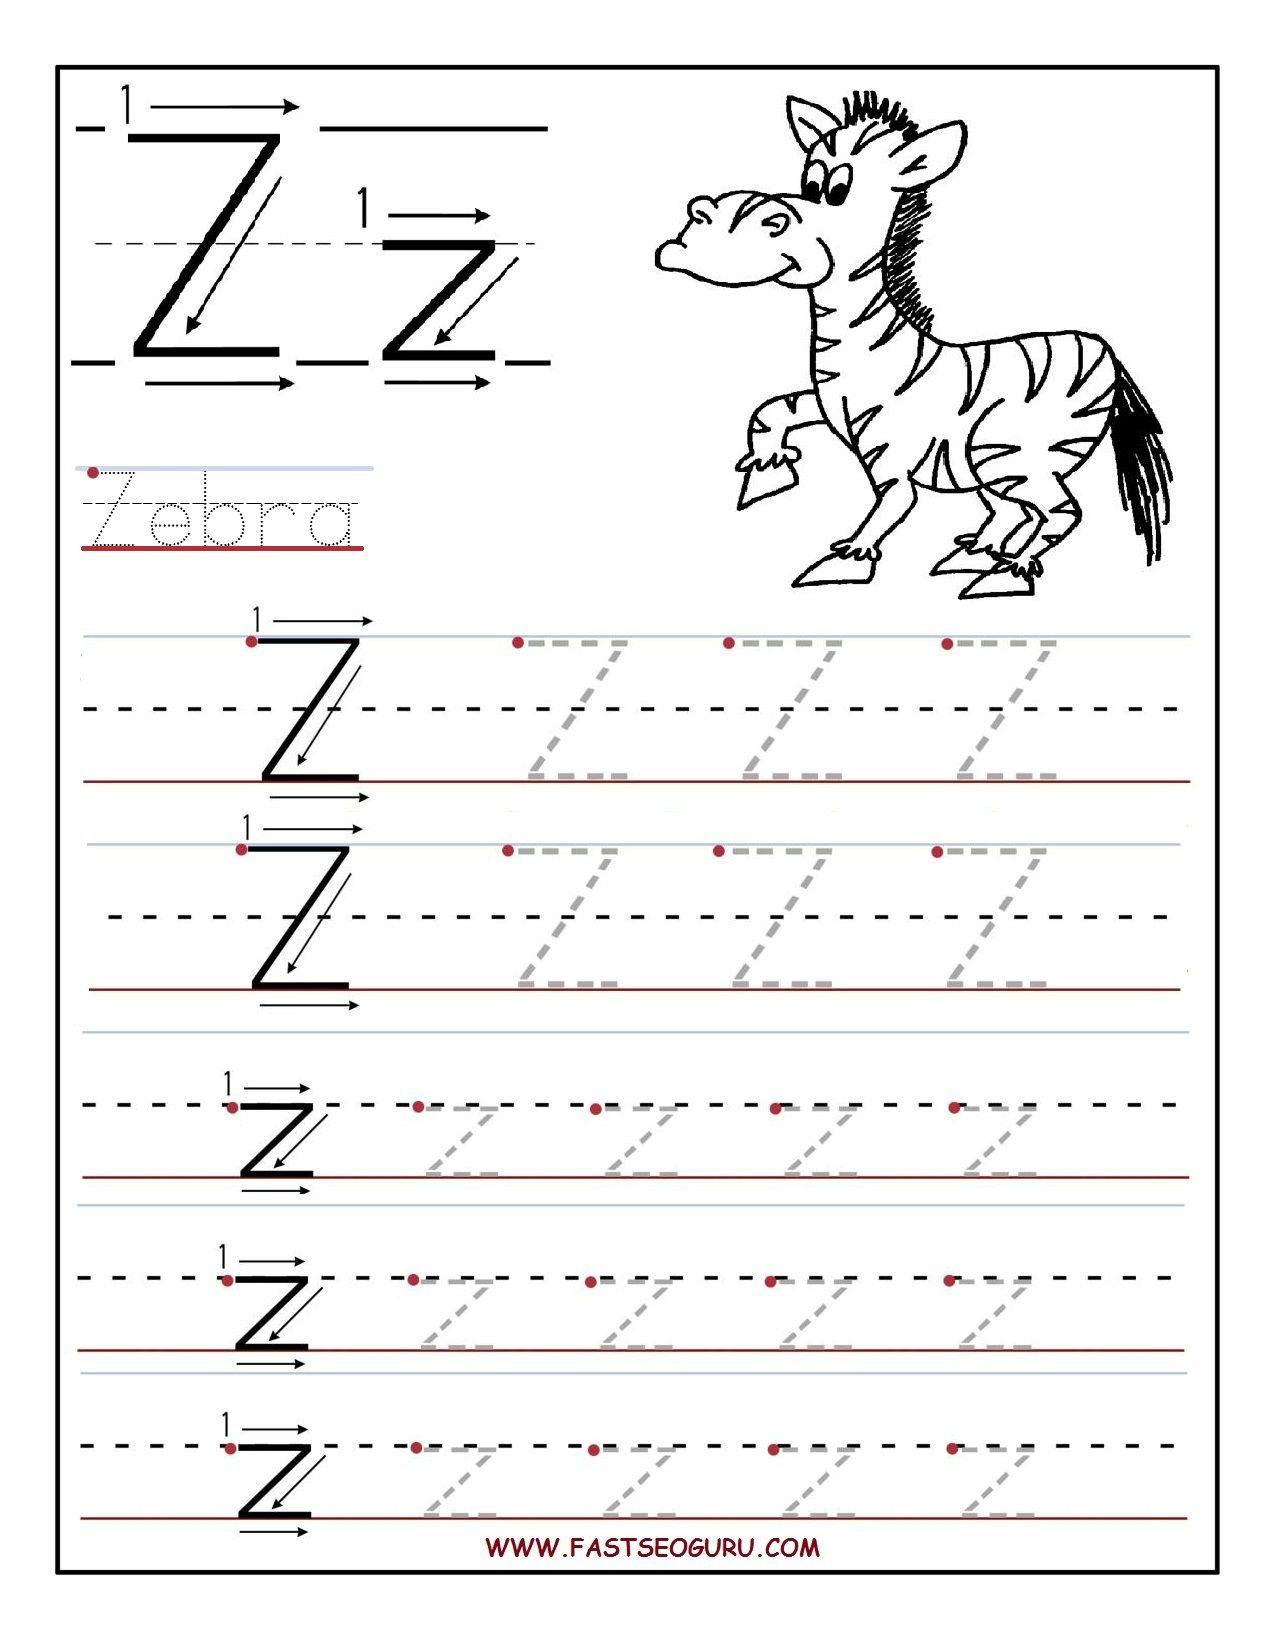 Pinvilfran Gason On Decor | Alphabet Worksheets, Letter Tracing - Letter Z Worksheets Free Printable